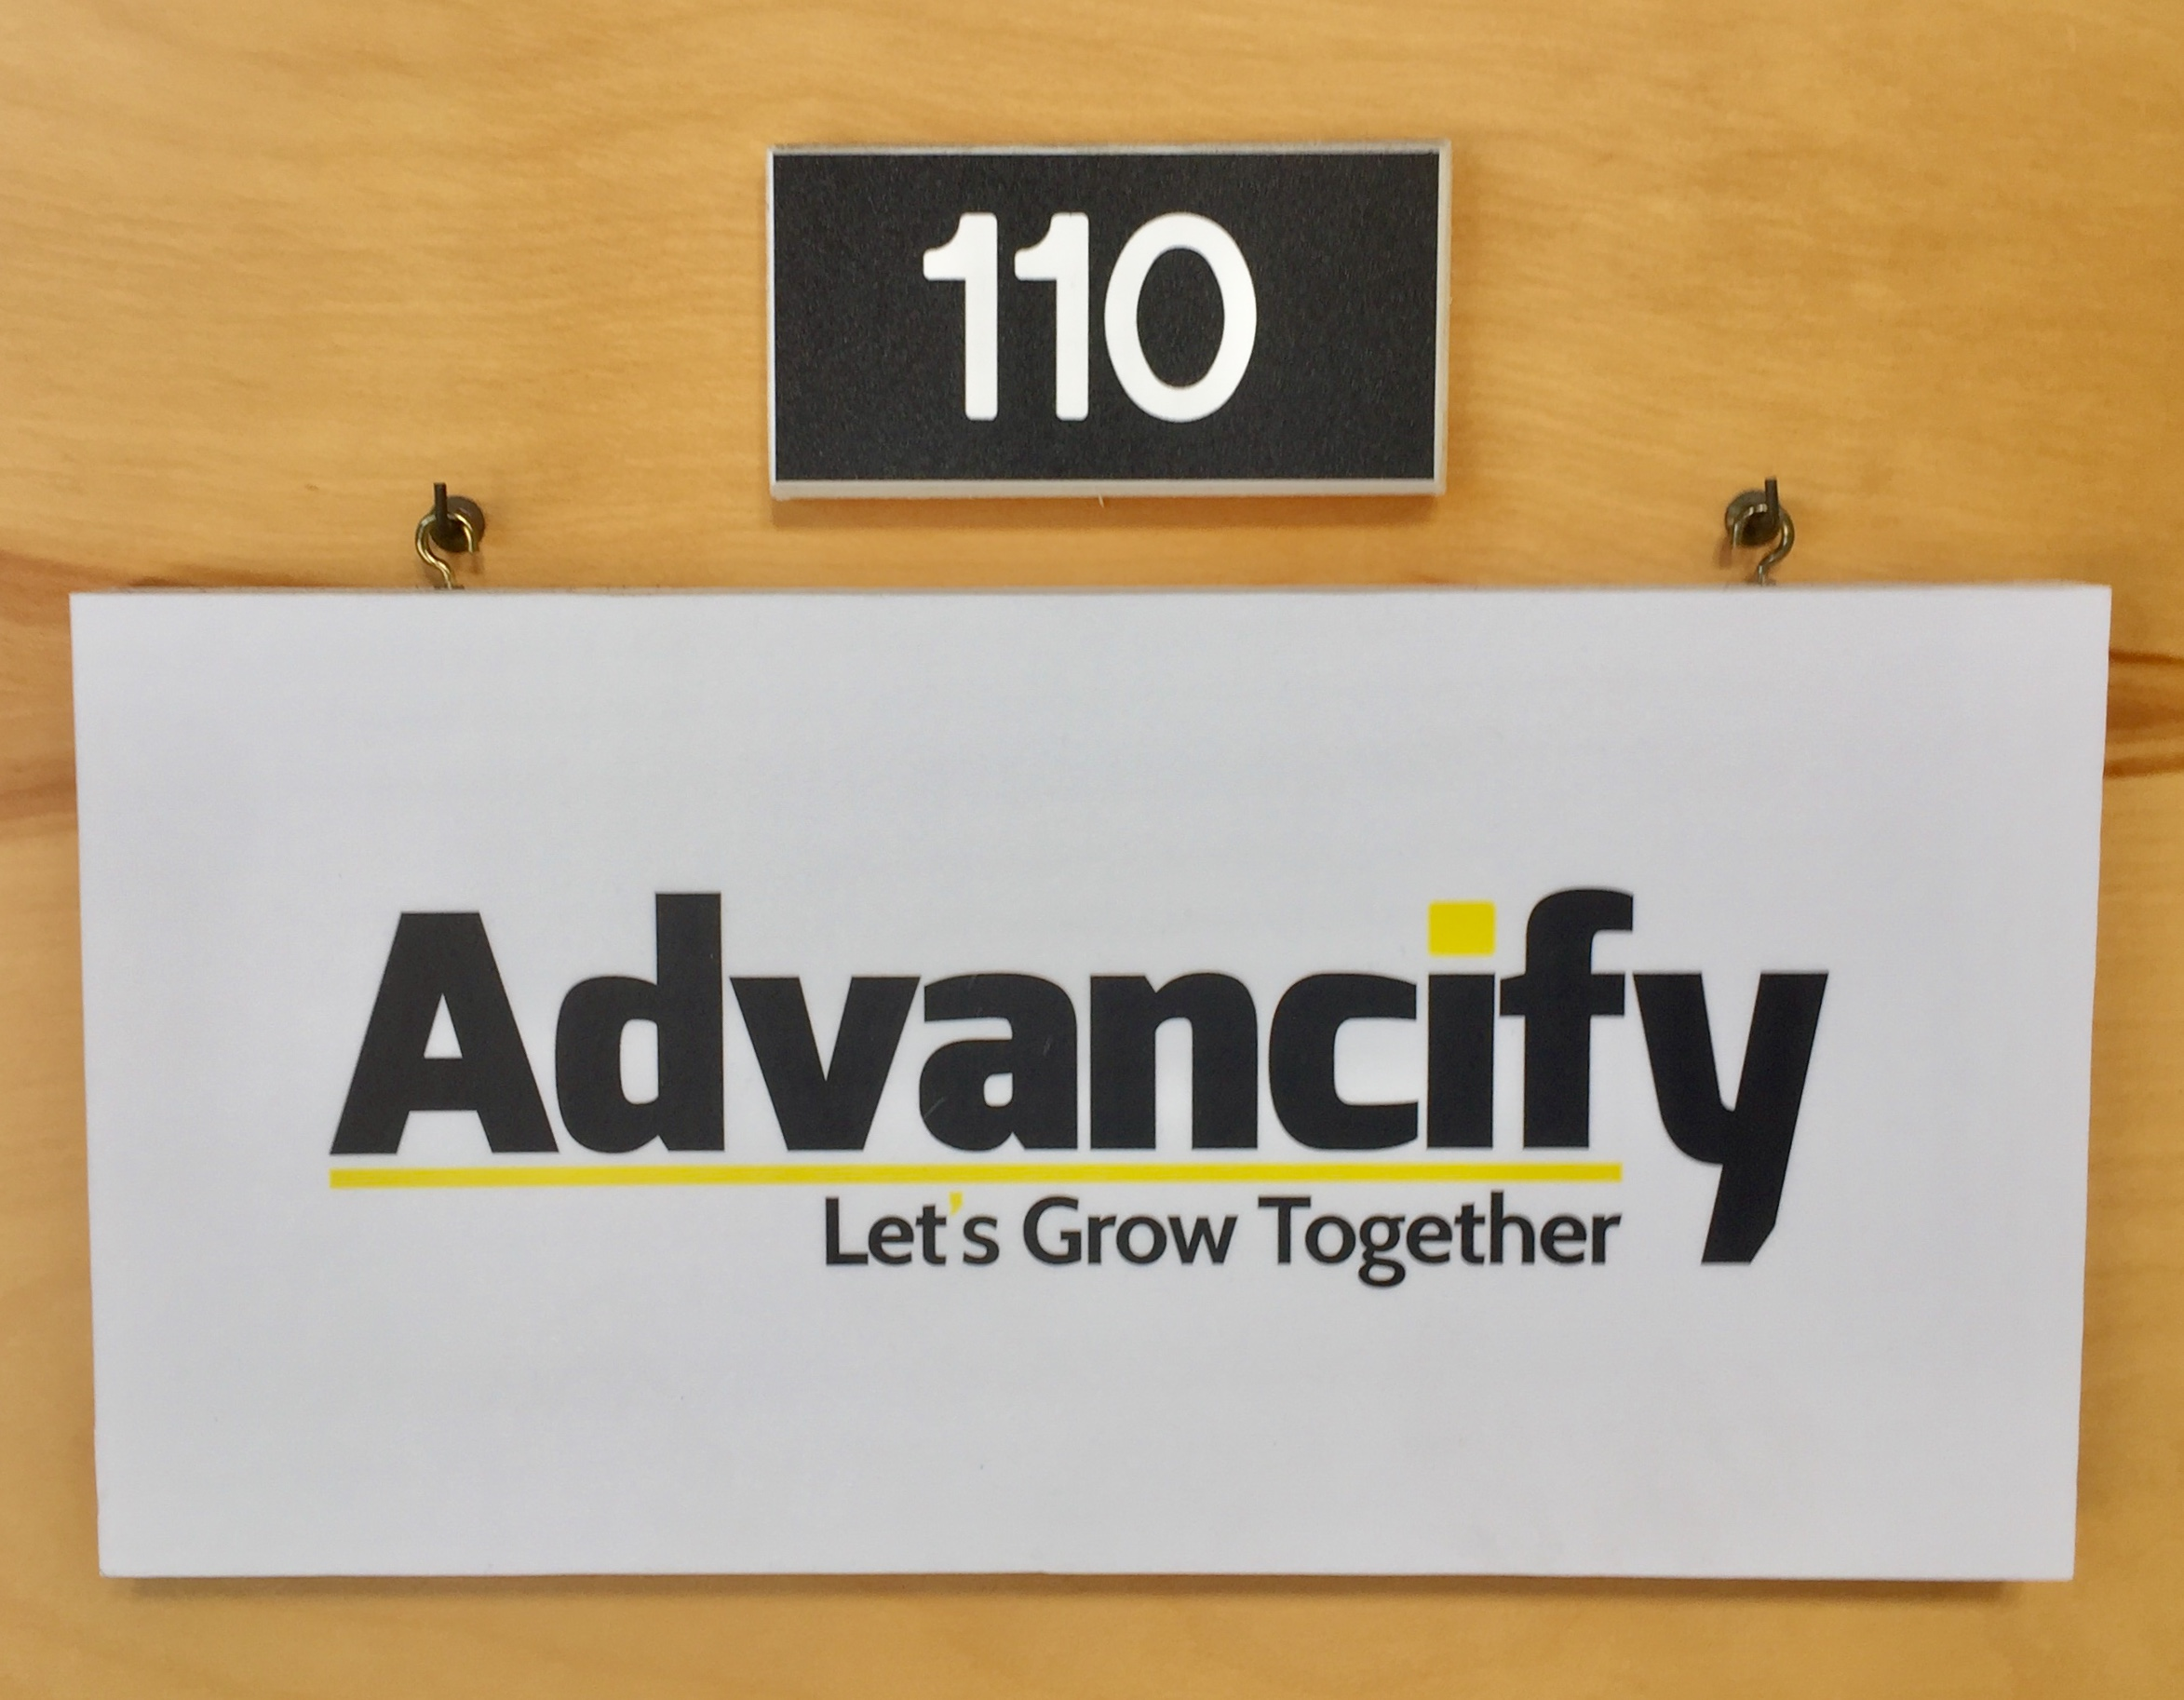 Advancify